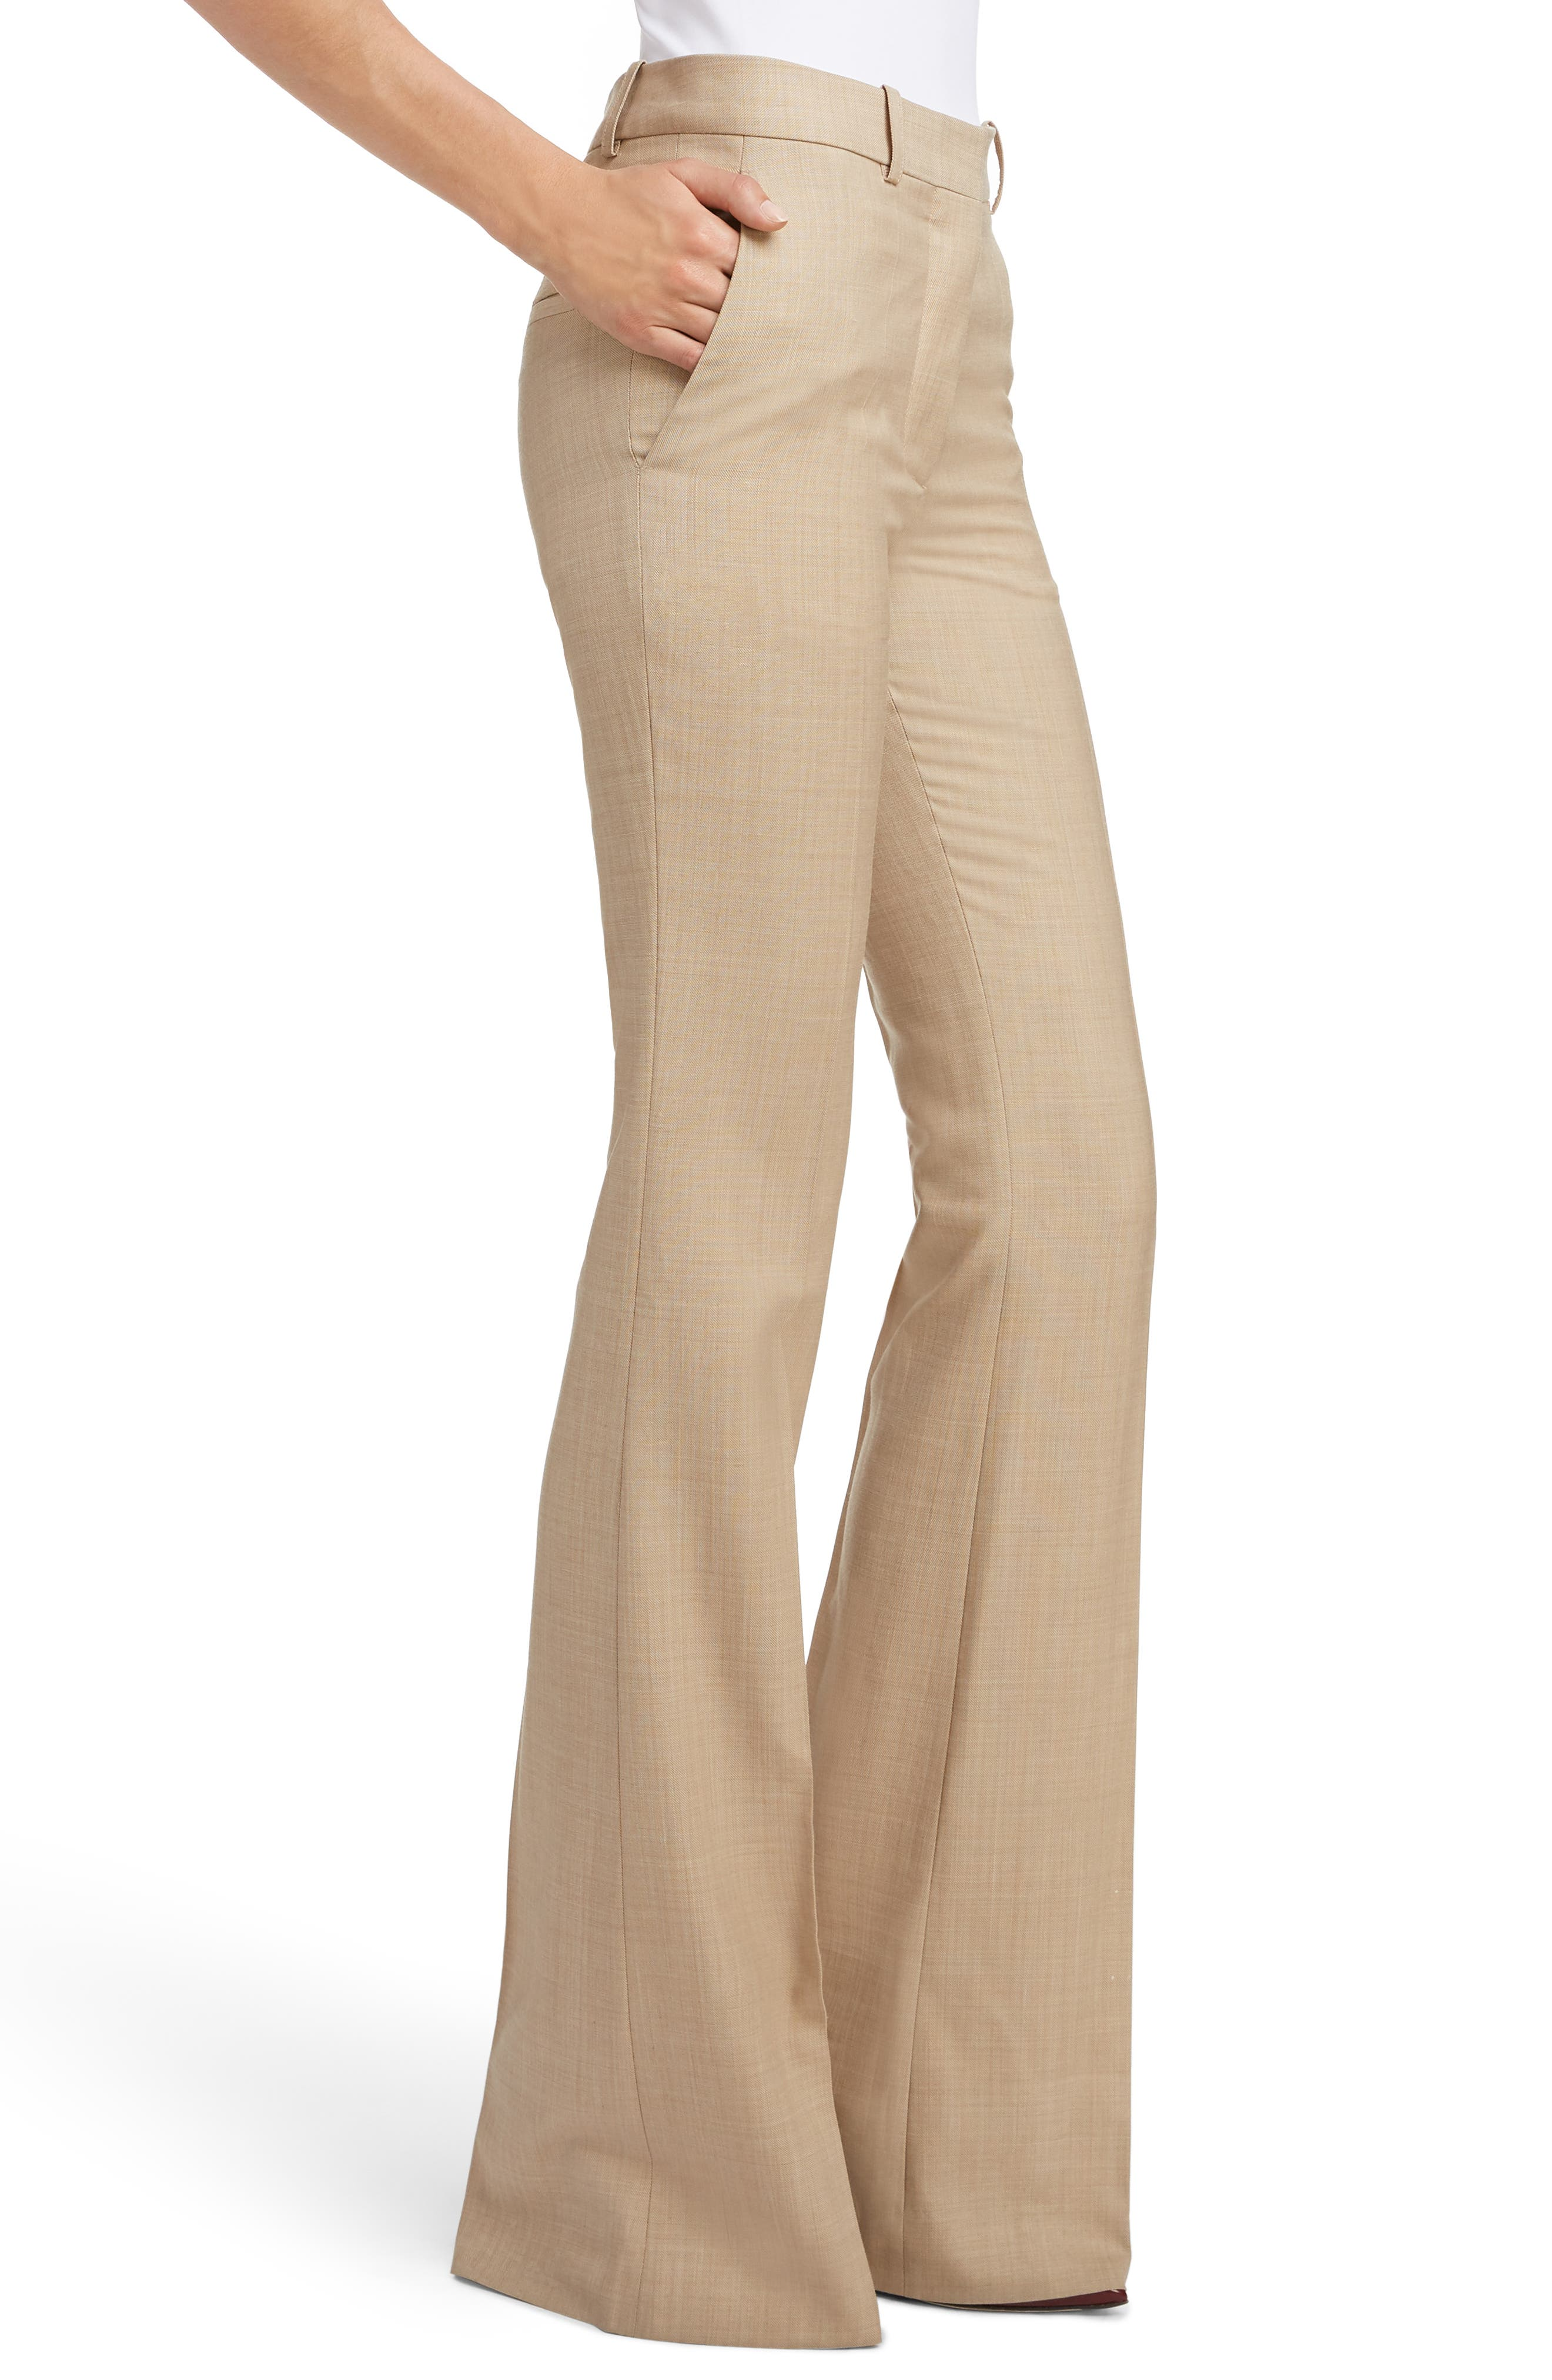 VICTORIA BECKHAM, High Waist Flare Wool Pants, Alternate thumbnail 4, color, LIGHT BEIGE-WHITE